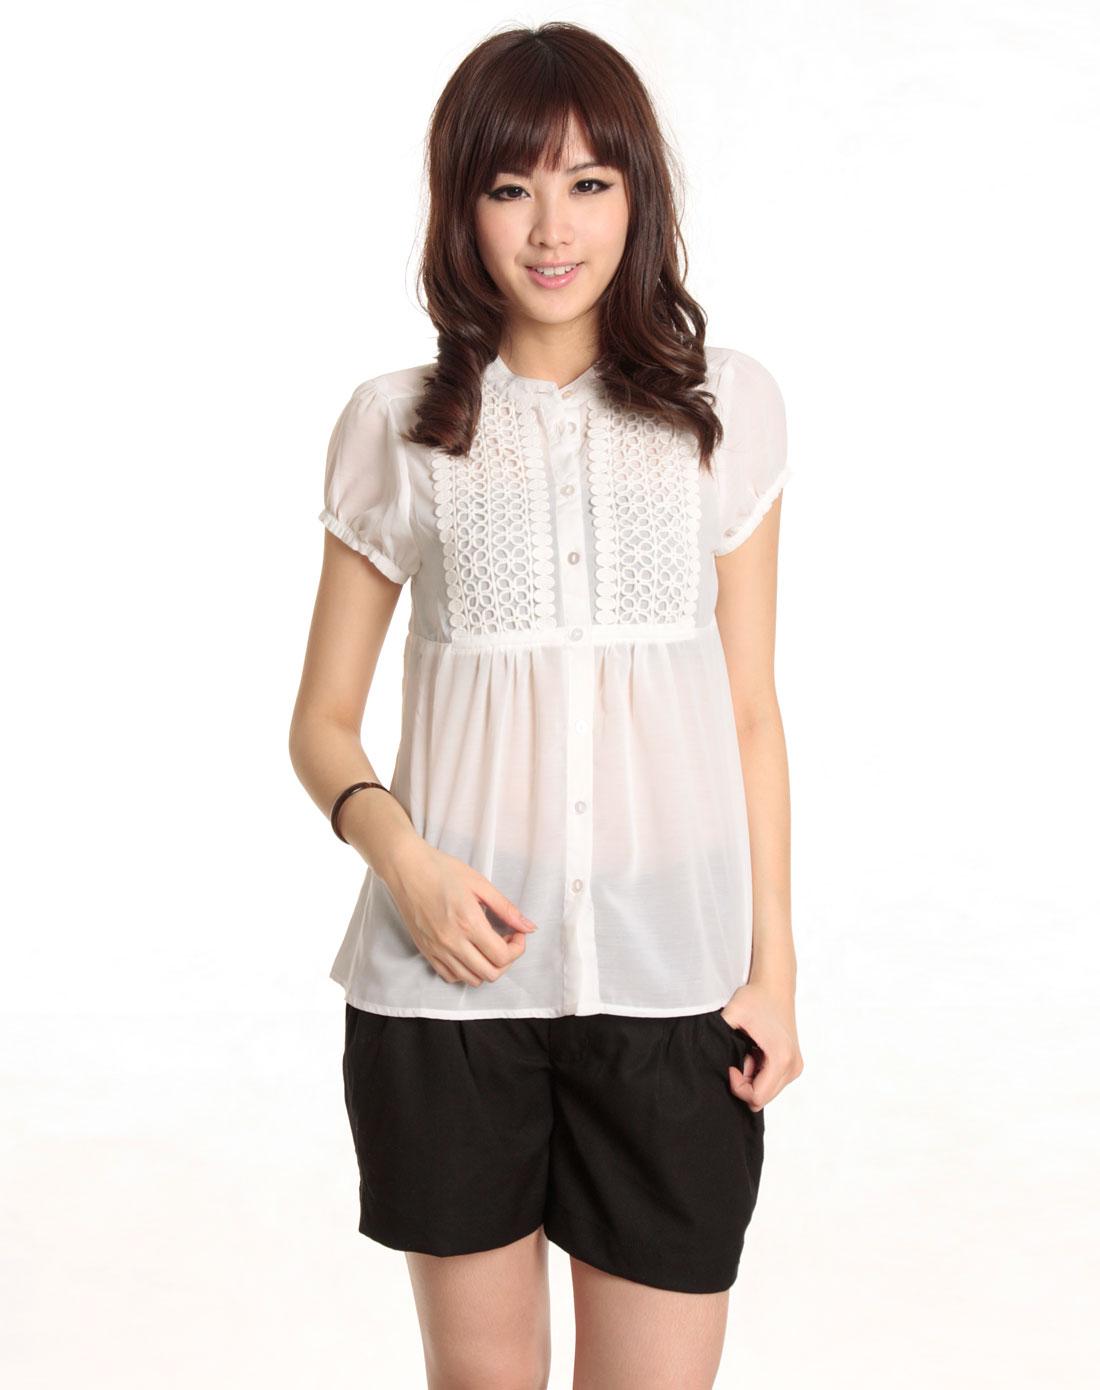 关中�9�c_特玞娜tapenade-白色短袖雪纺衬衫